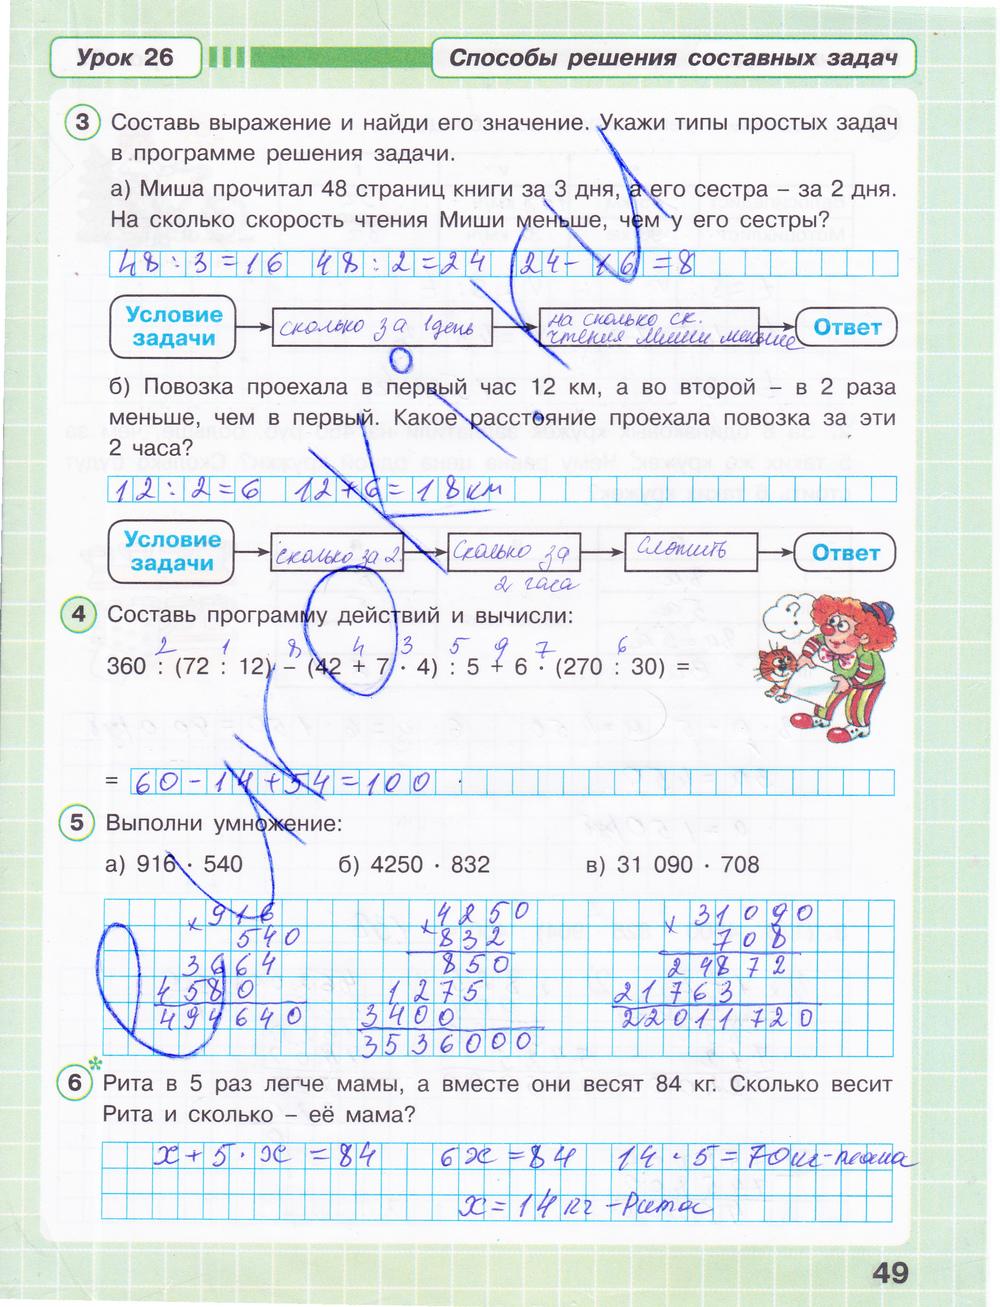 Гдз петерсон 3 класс ответы